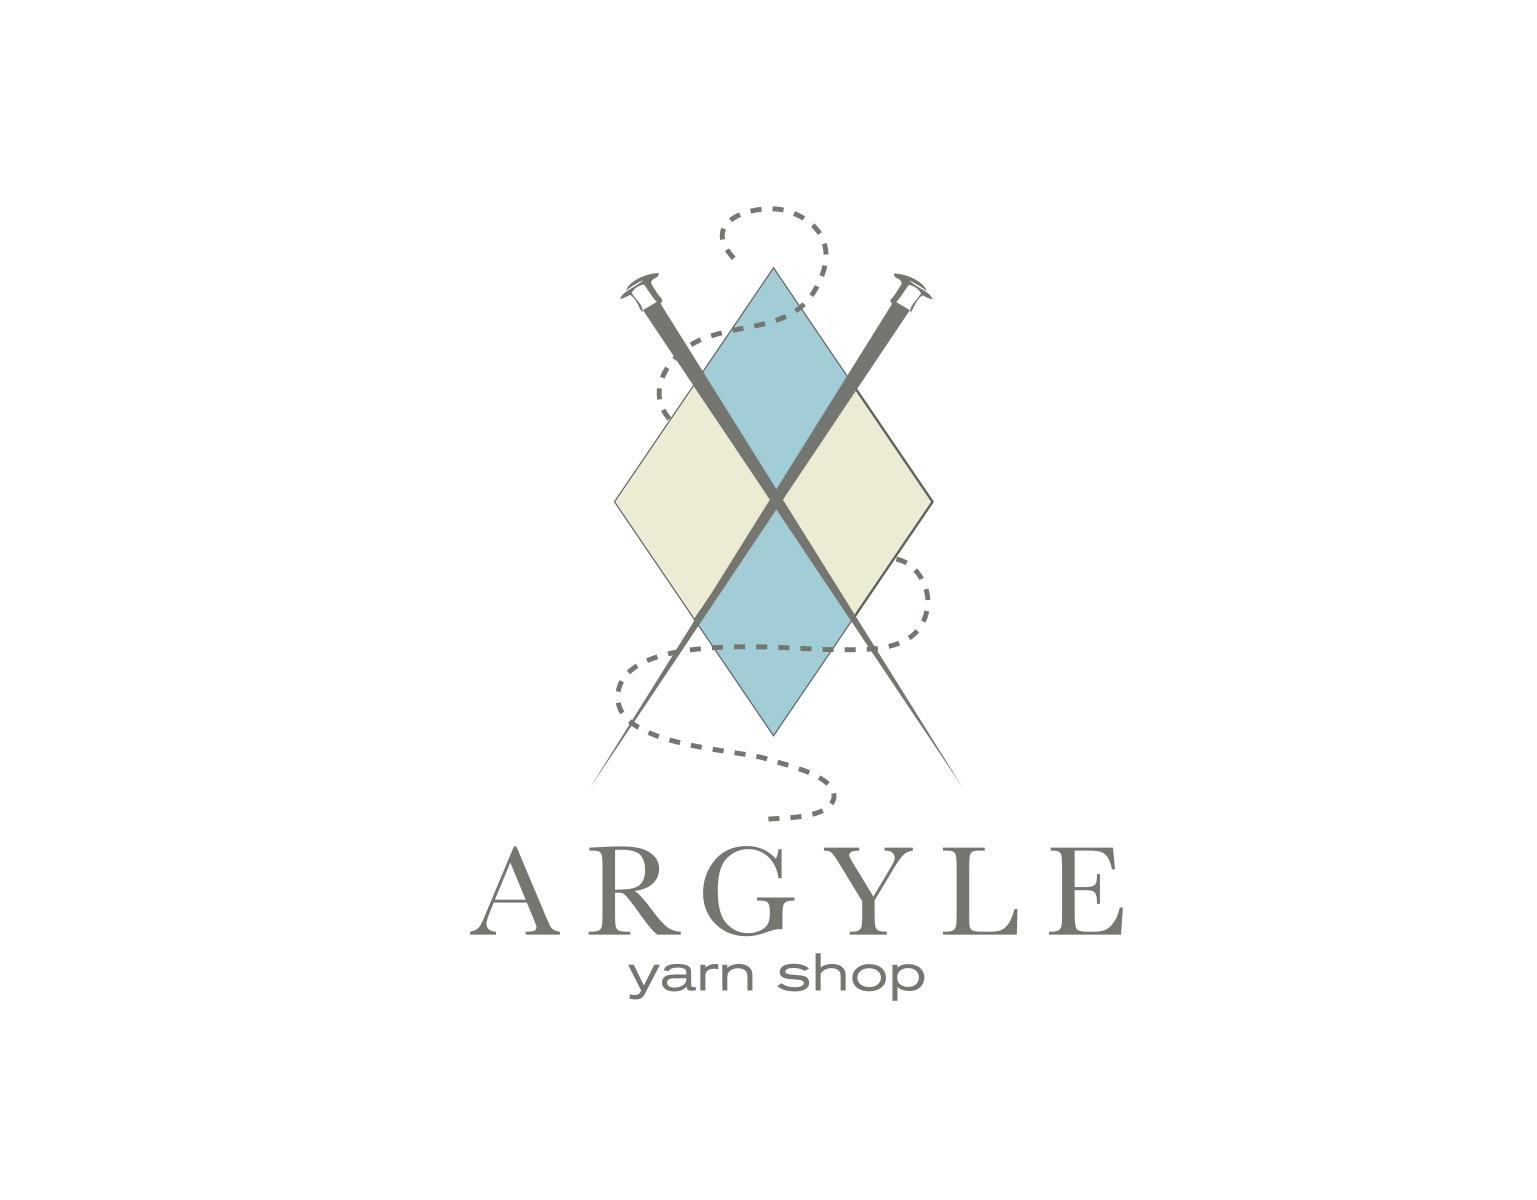 argyle logo.jpg